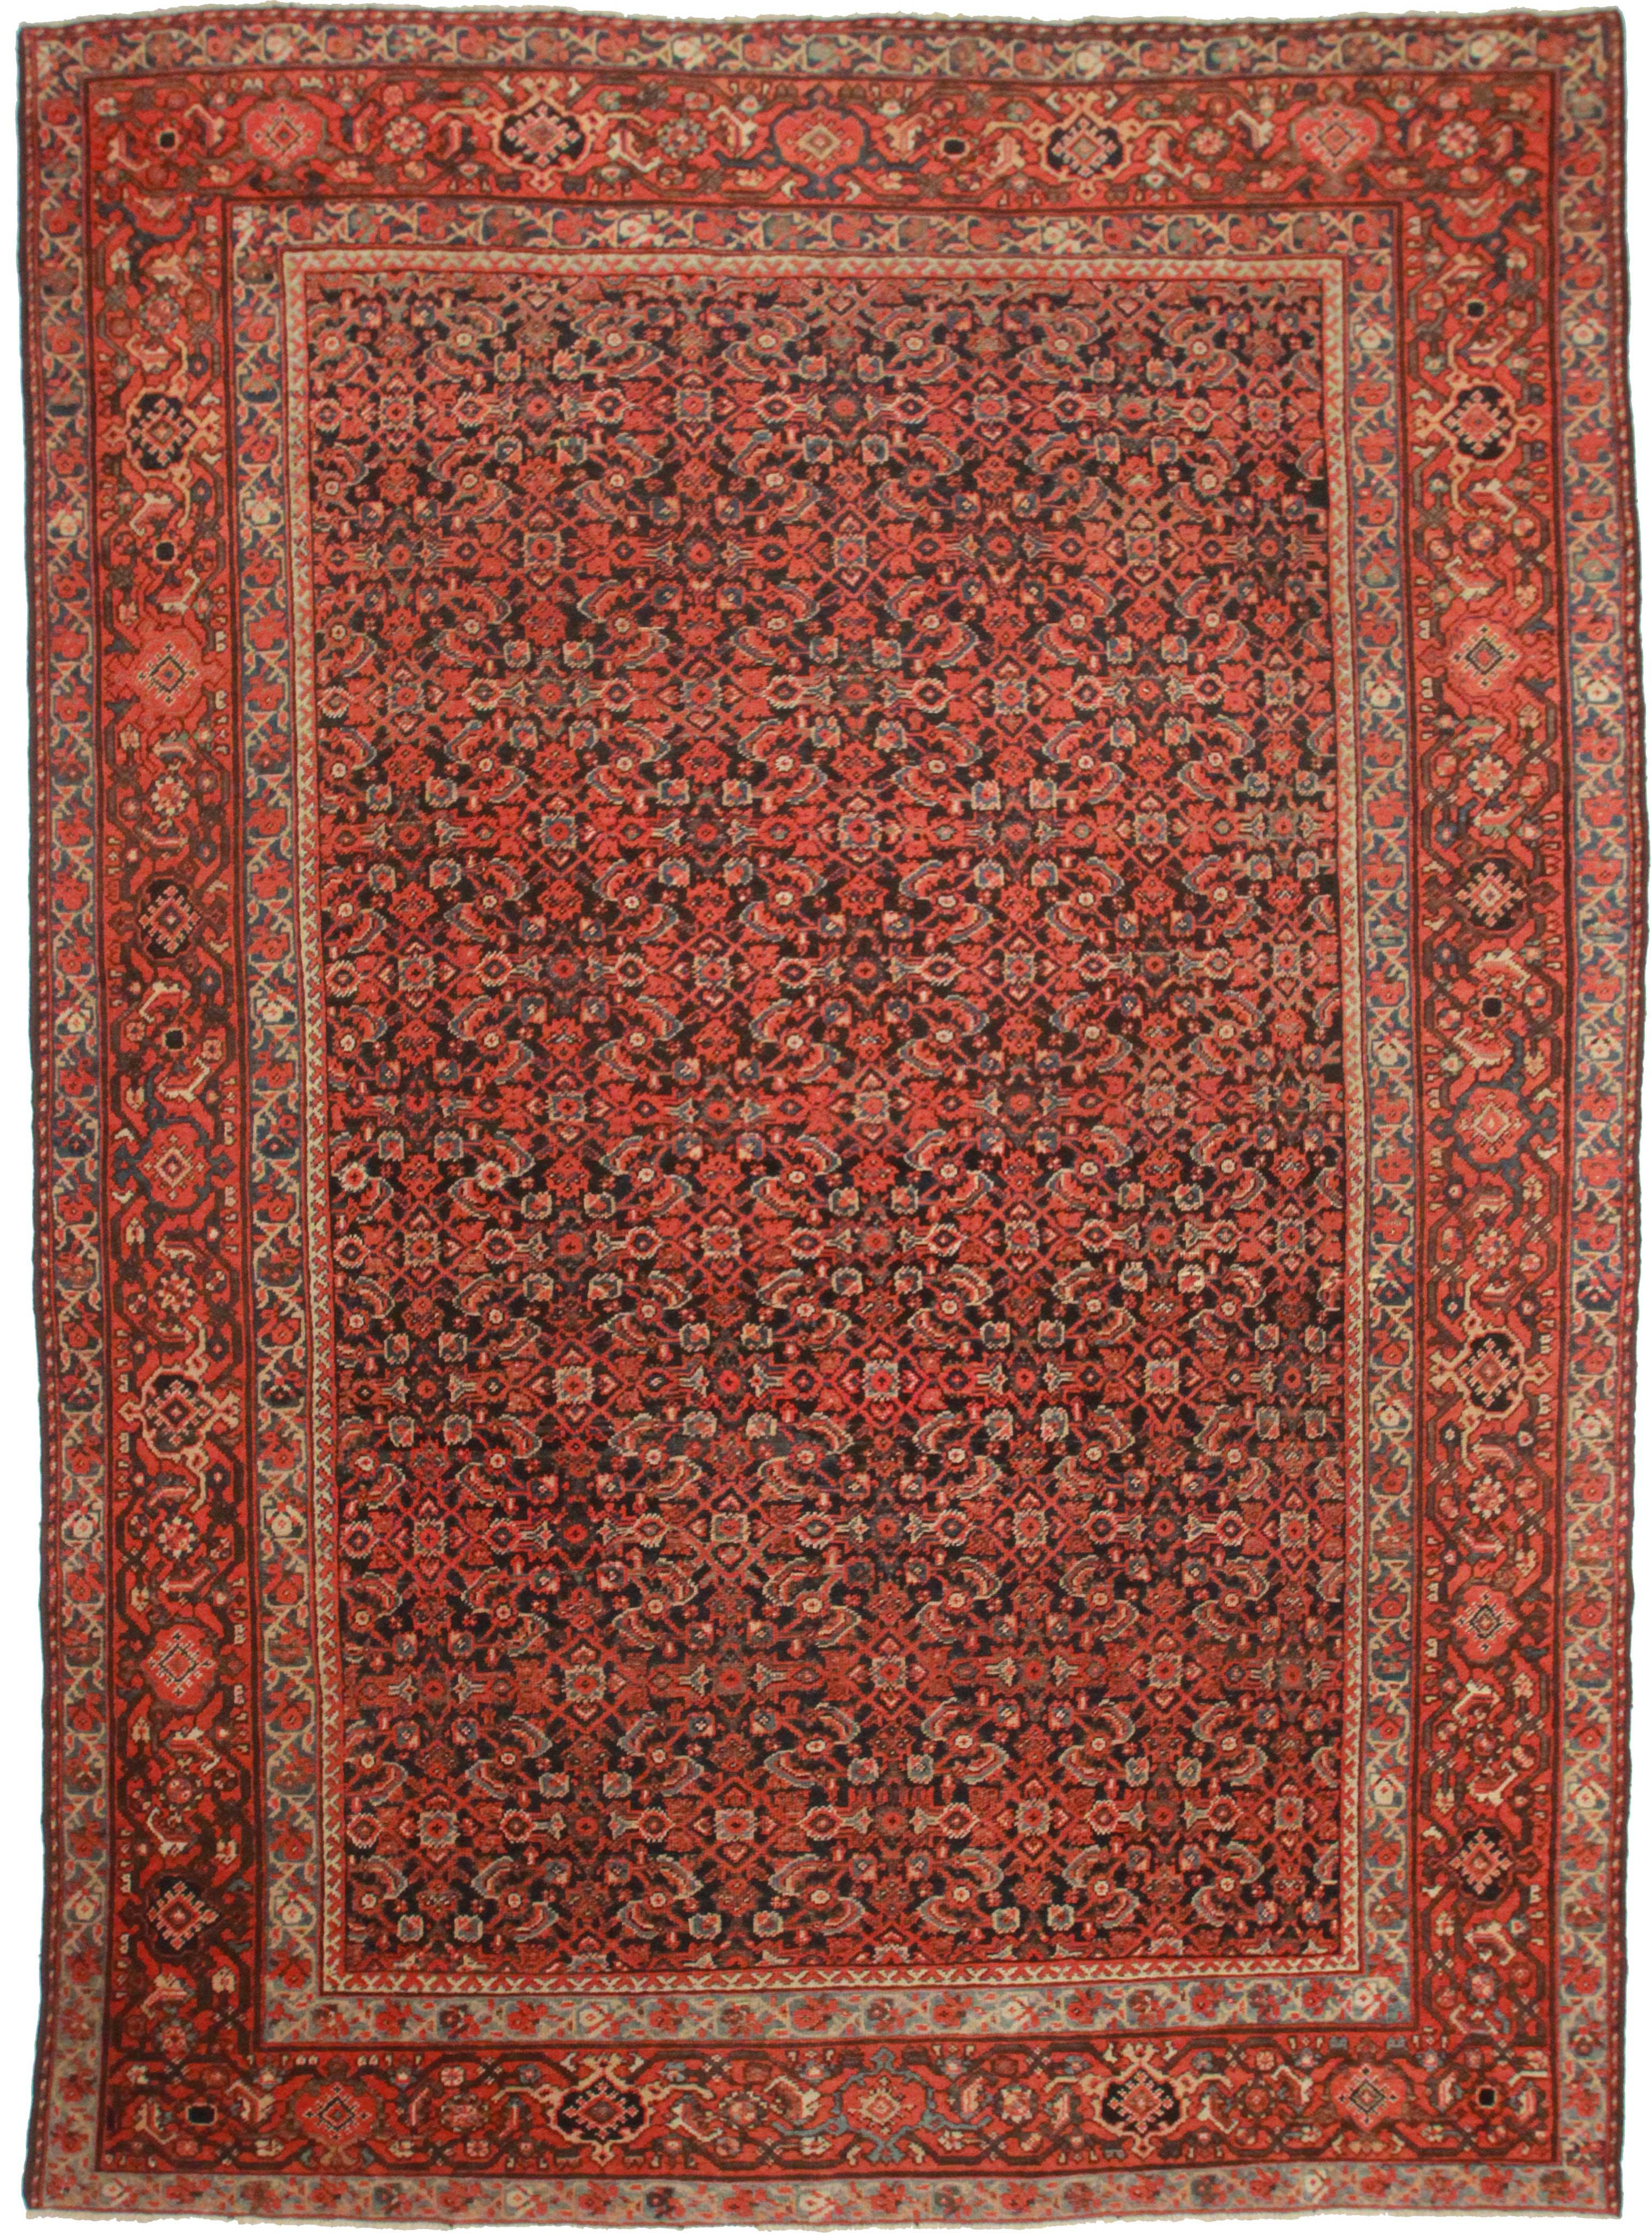 10 X 14 Antique Persian Mahal Rug 9510 Exclusive Oriental Rugs